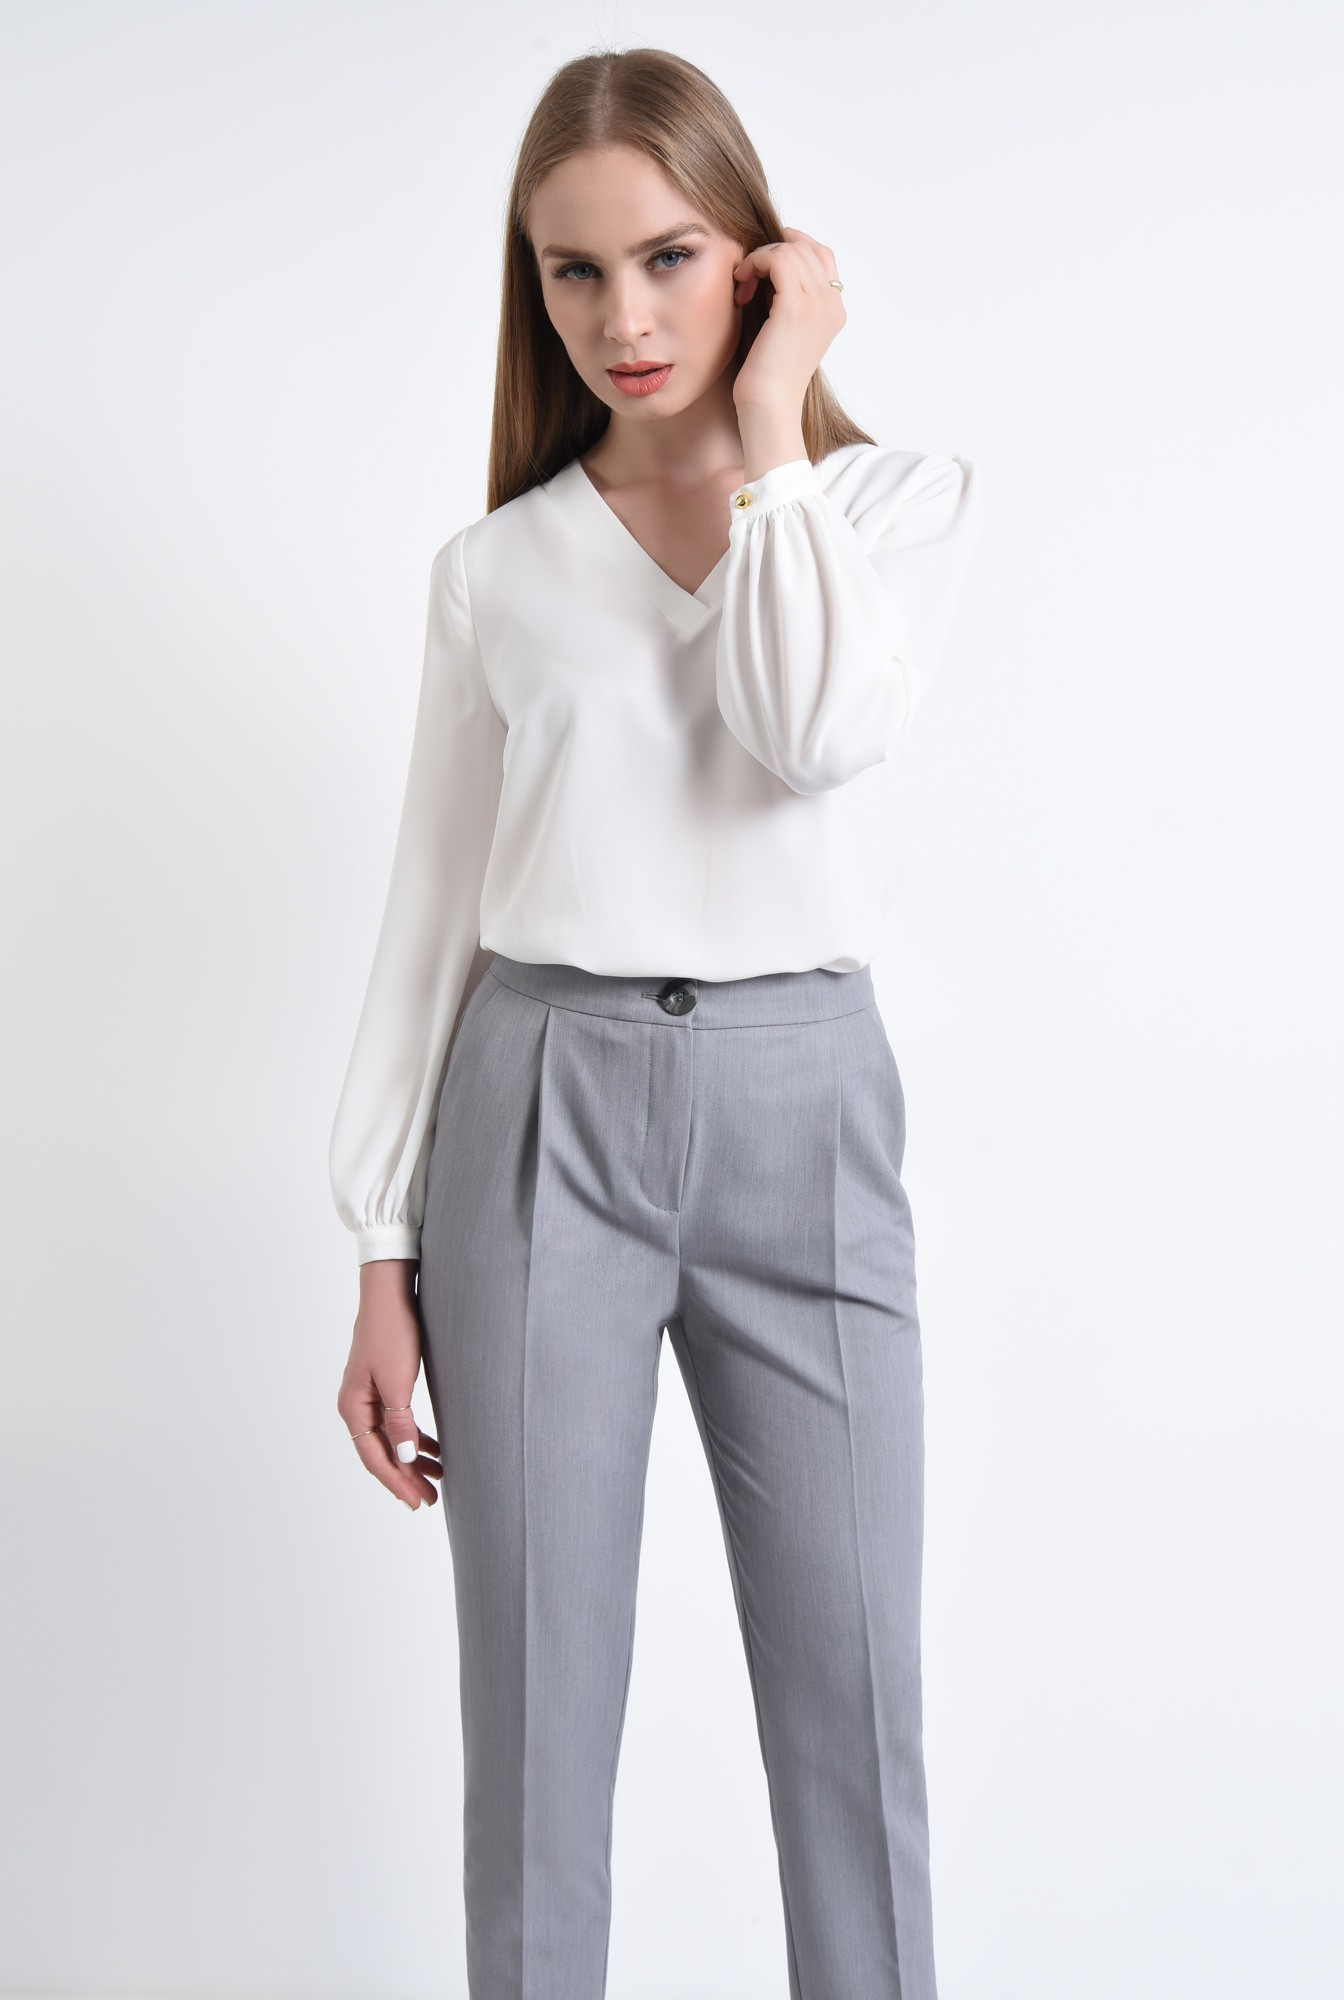 0 - 360 - Pantaloni casual, cu buzunare, lungi